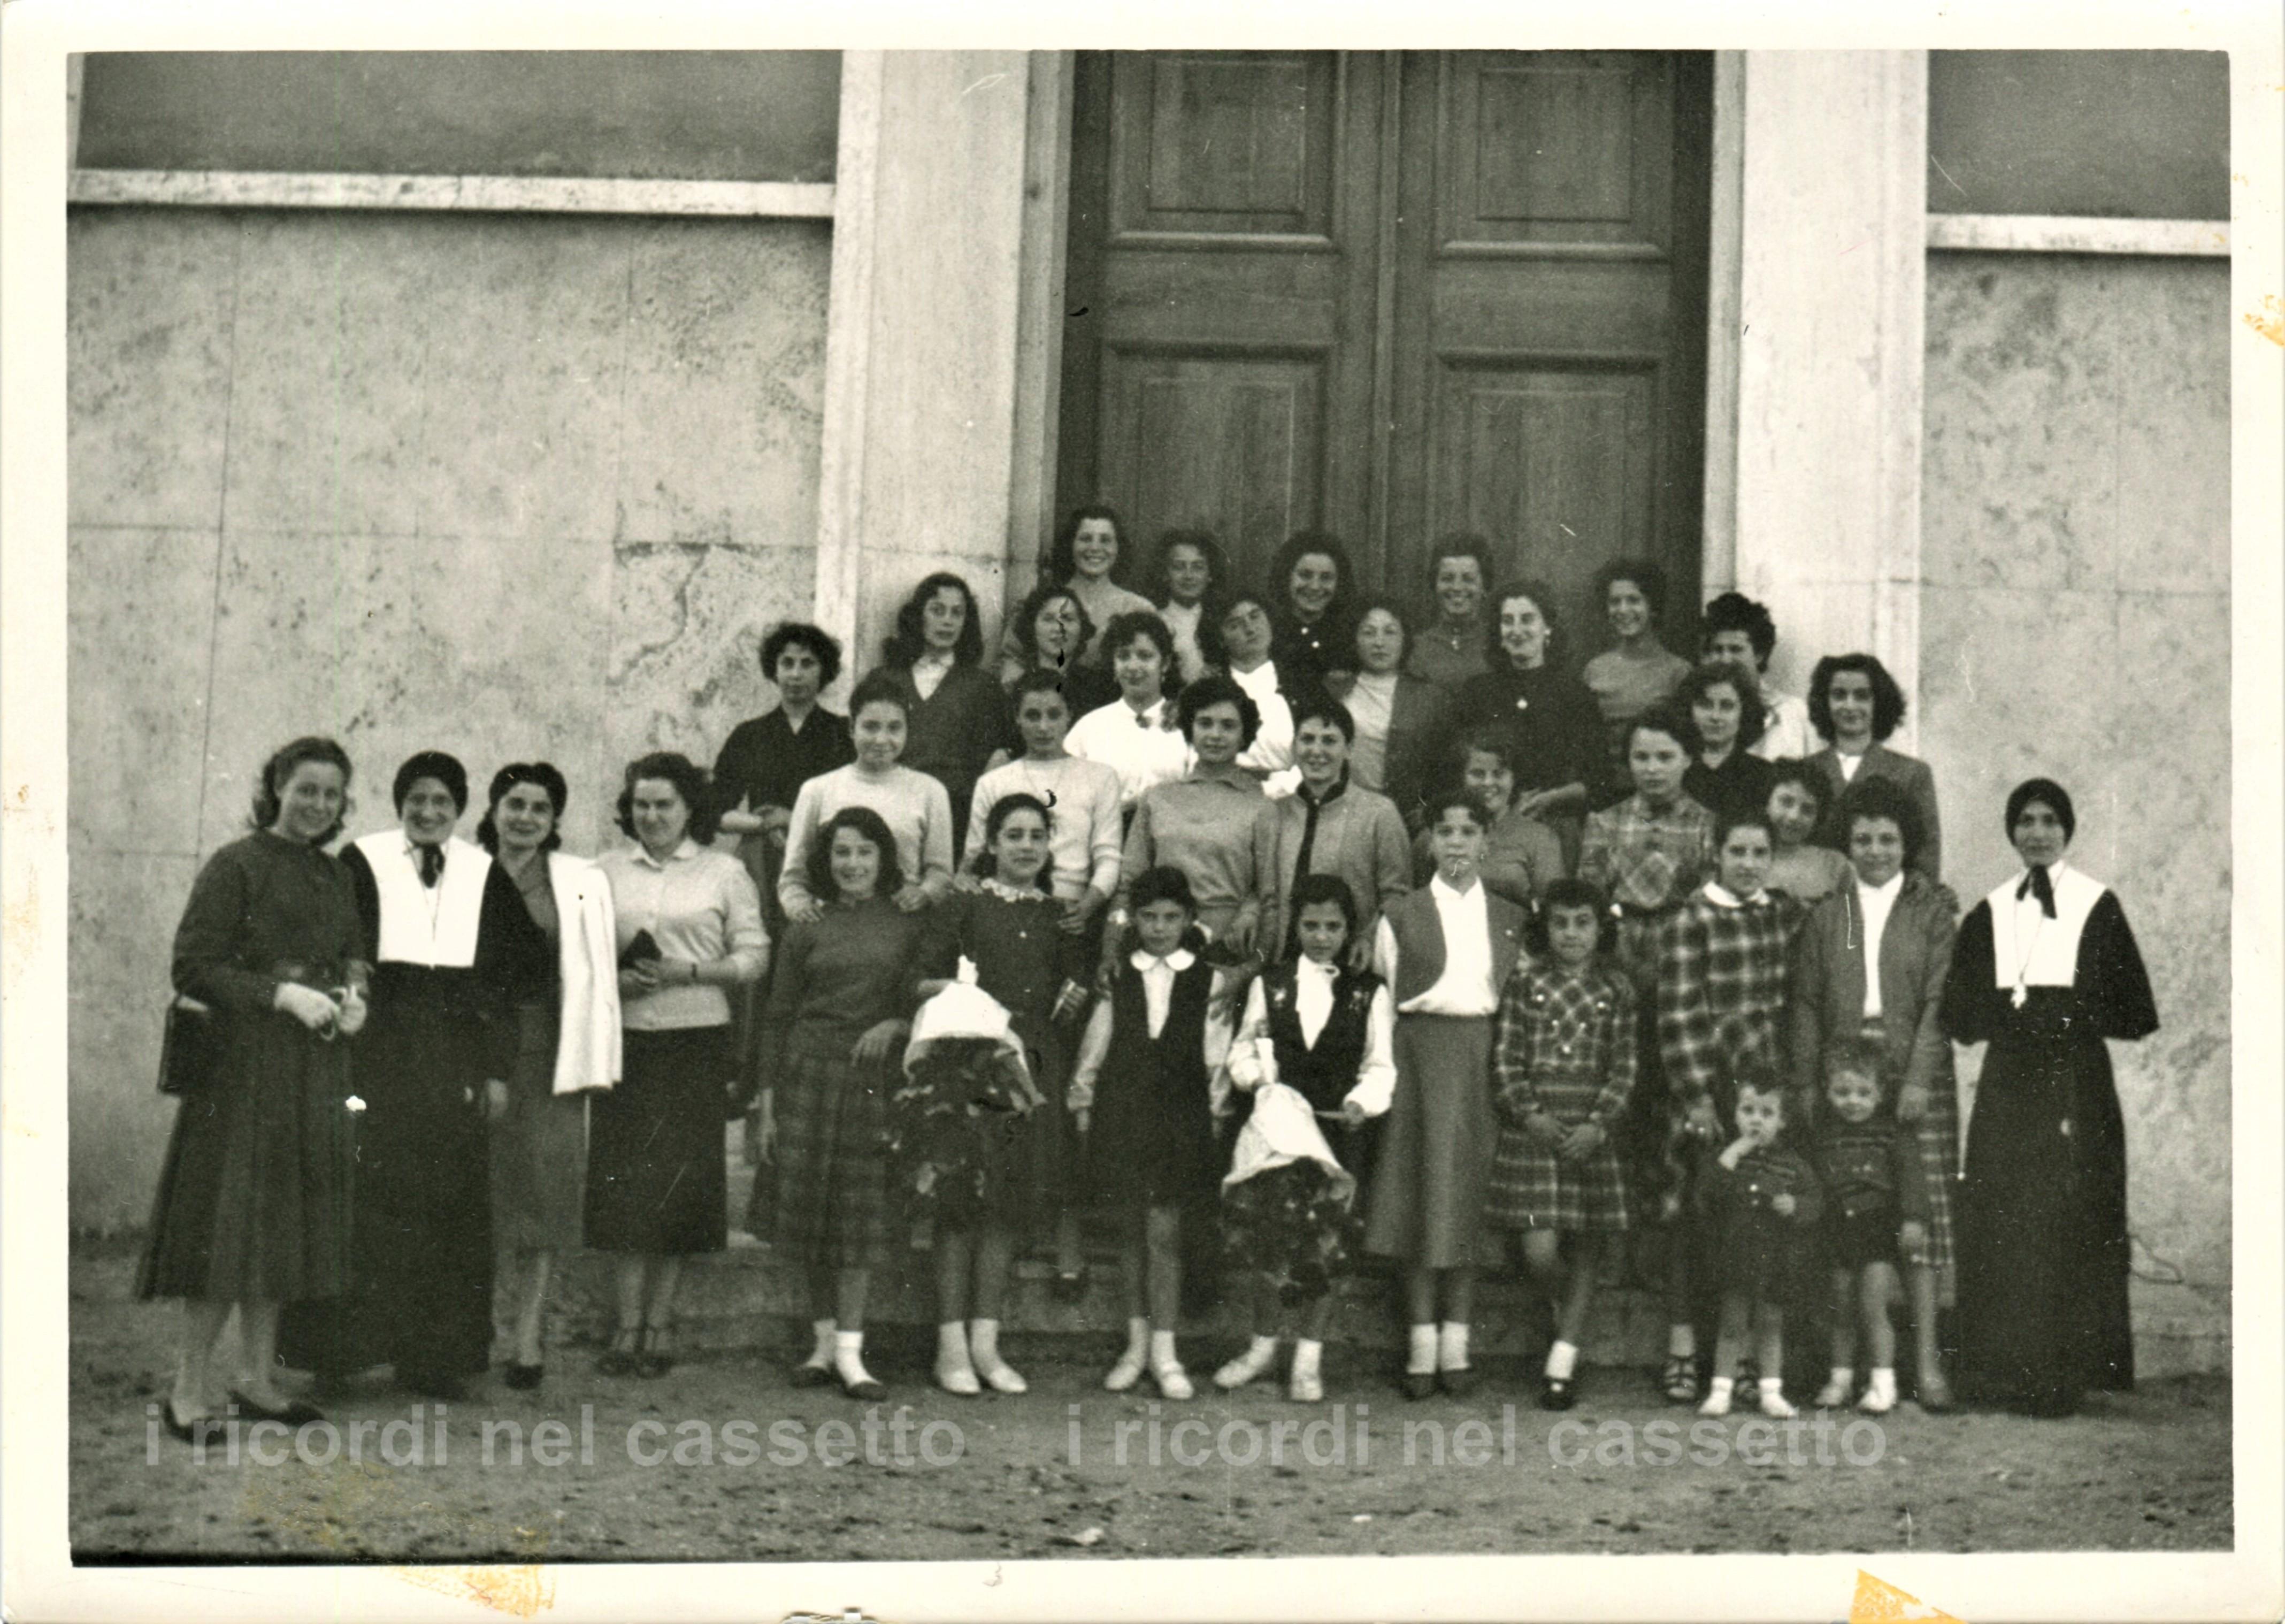 <h3>Scuola Vincenza Altamura</h3>